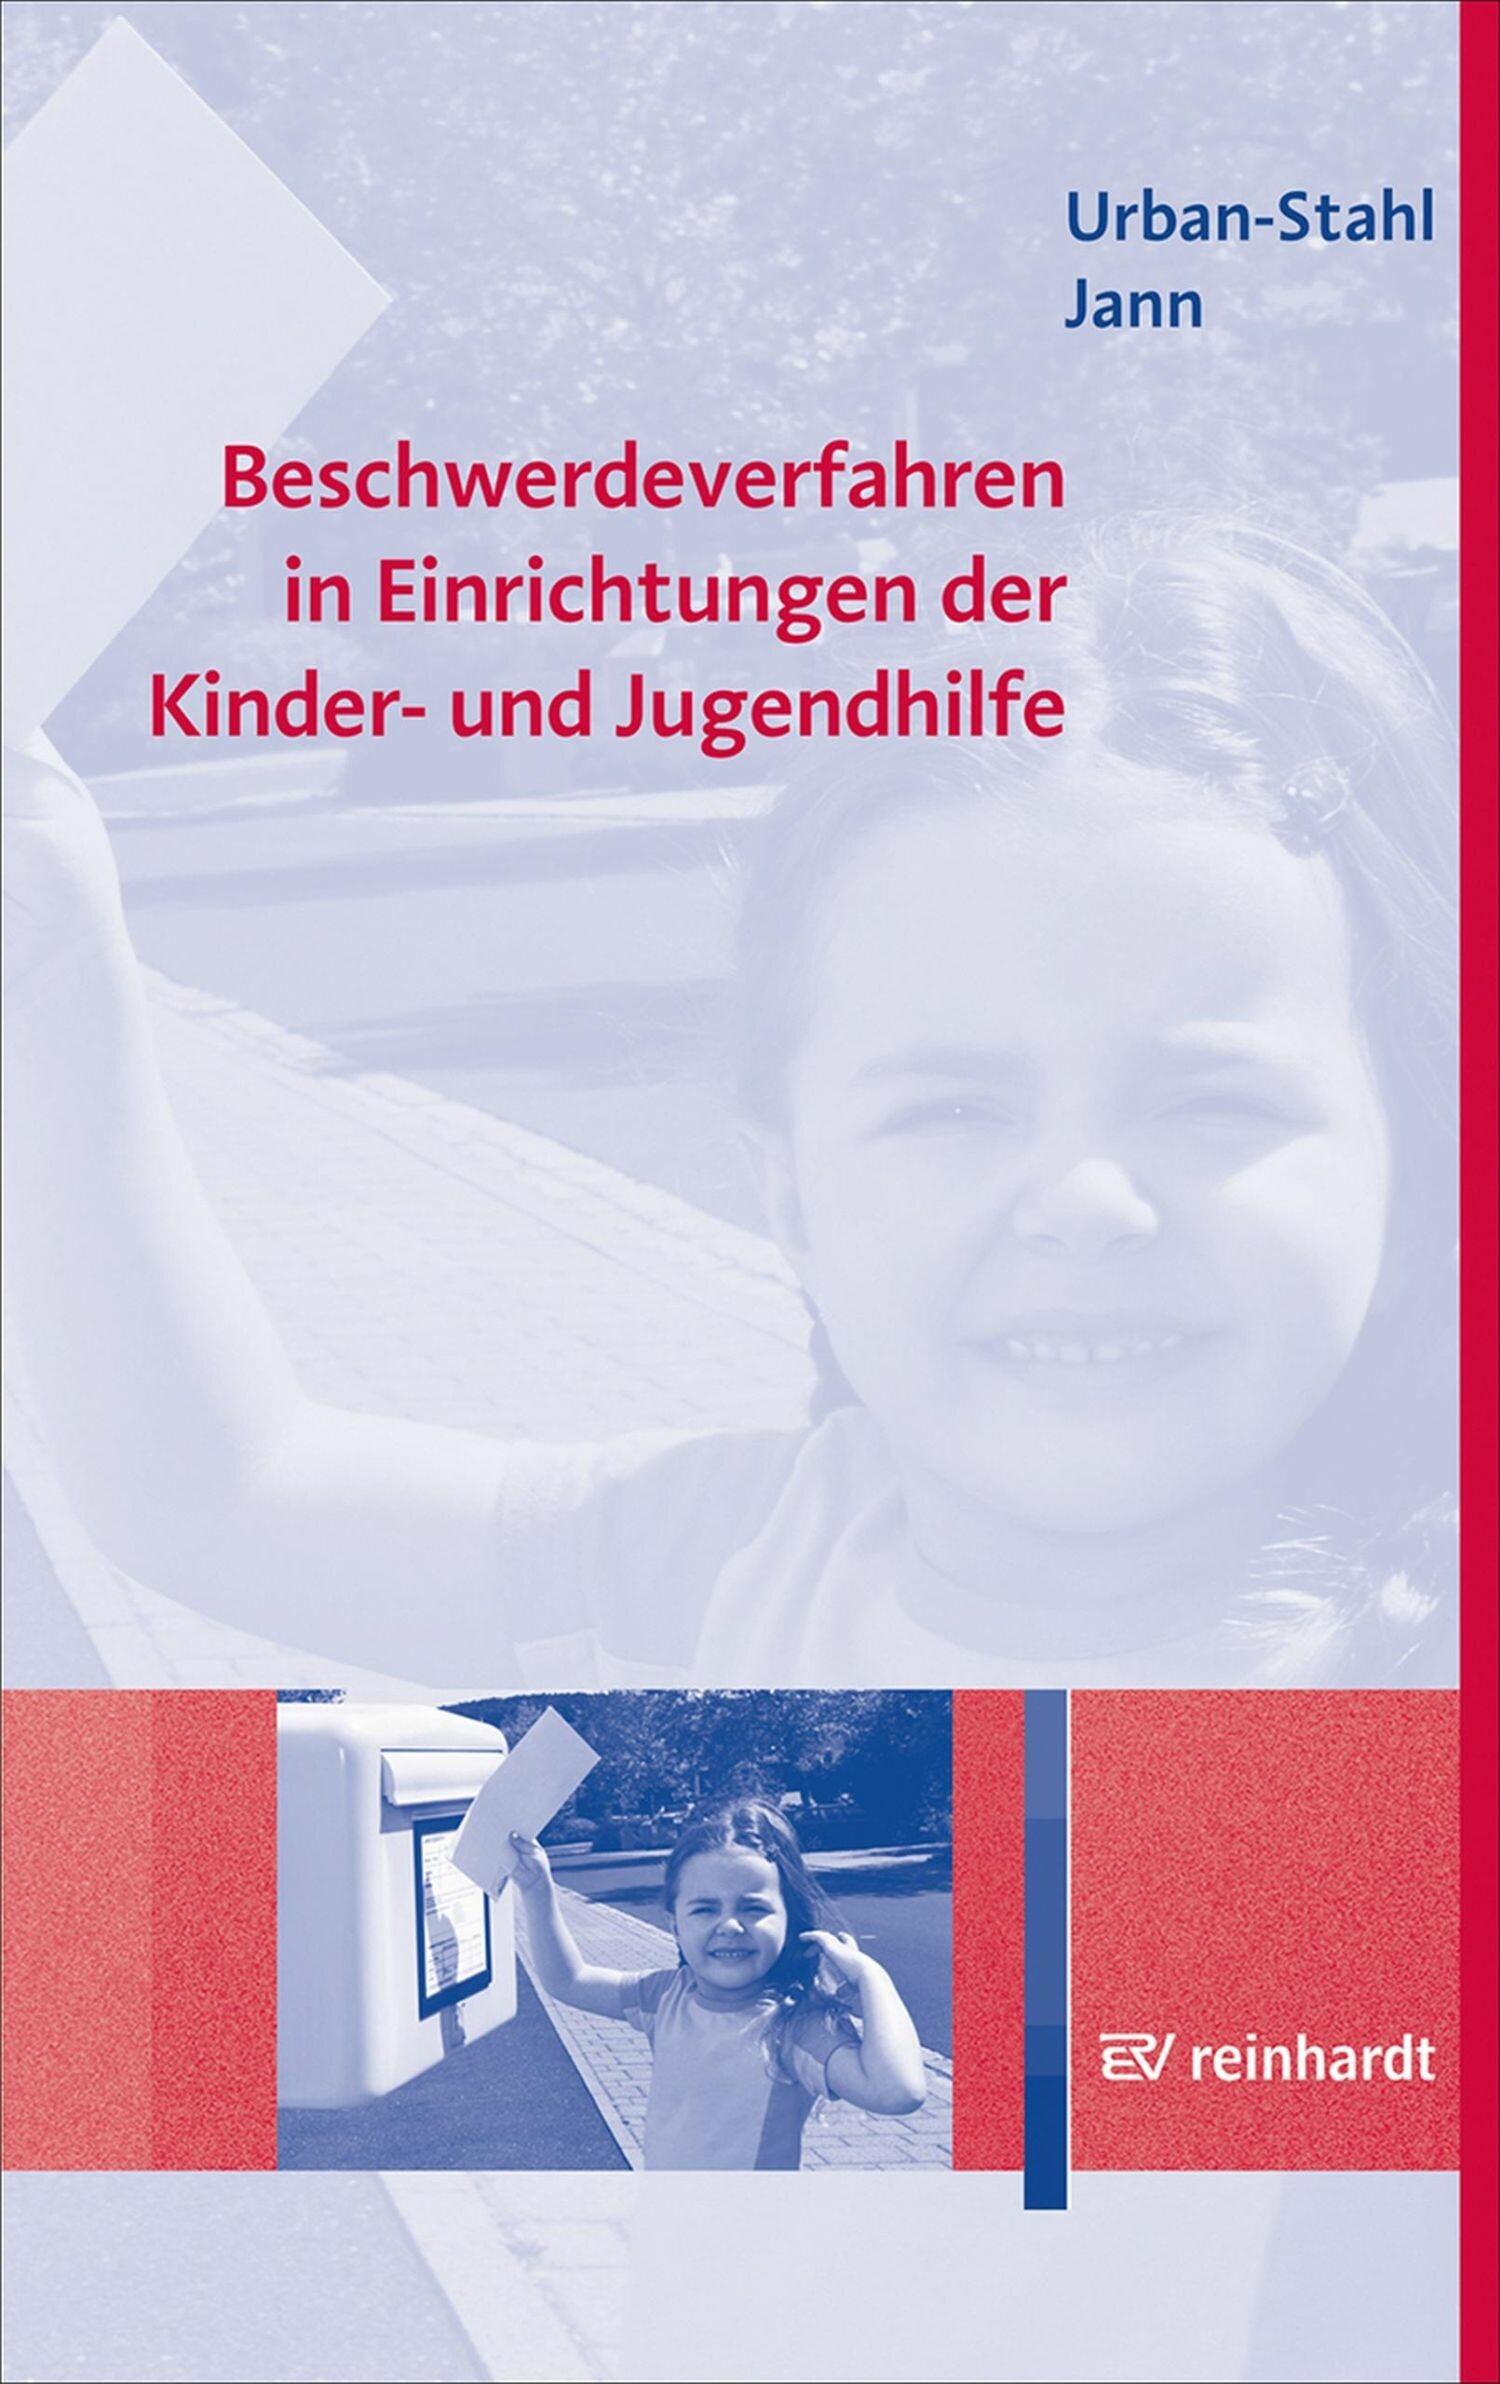 Jugendhilfe - Martinsclub Bremen